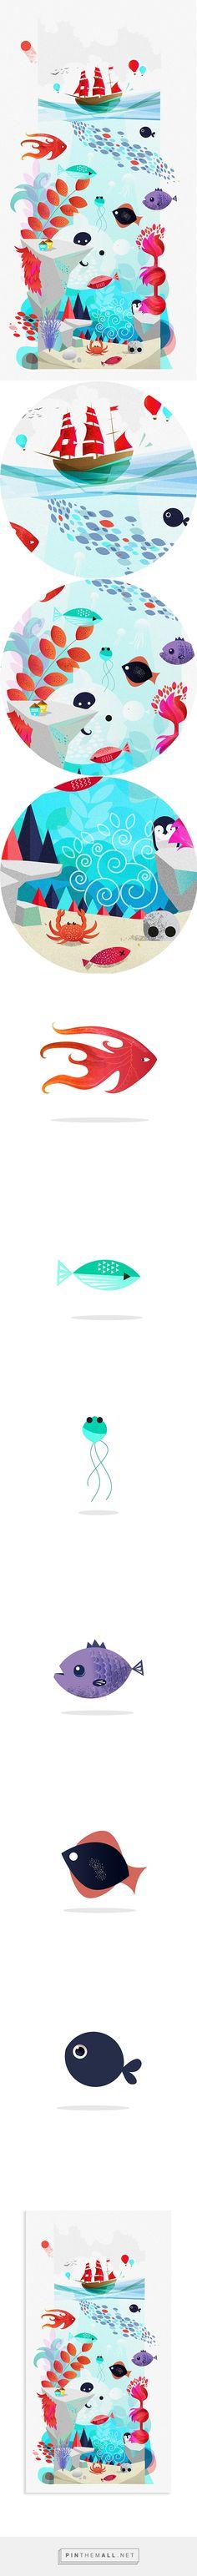 Sea Creatures on Behance